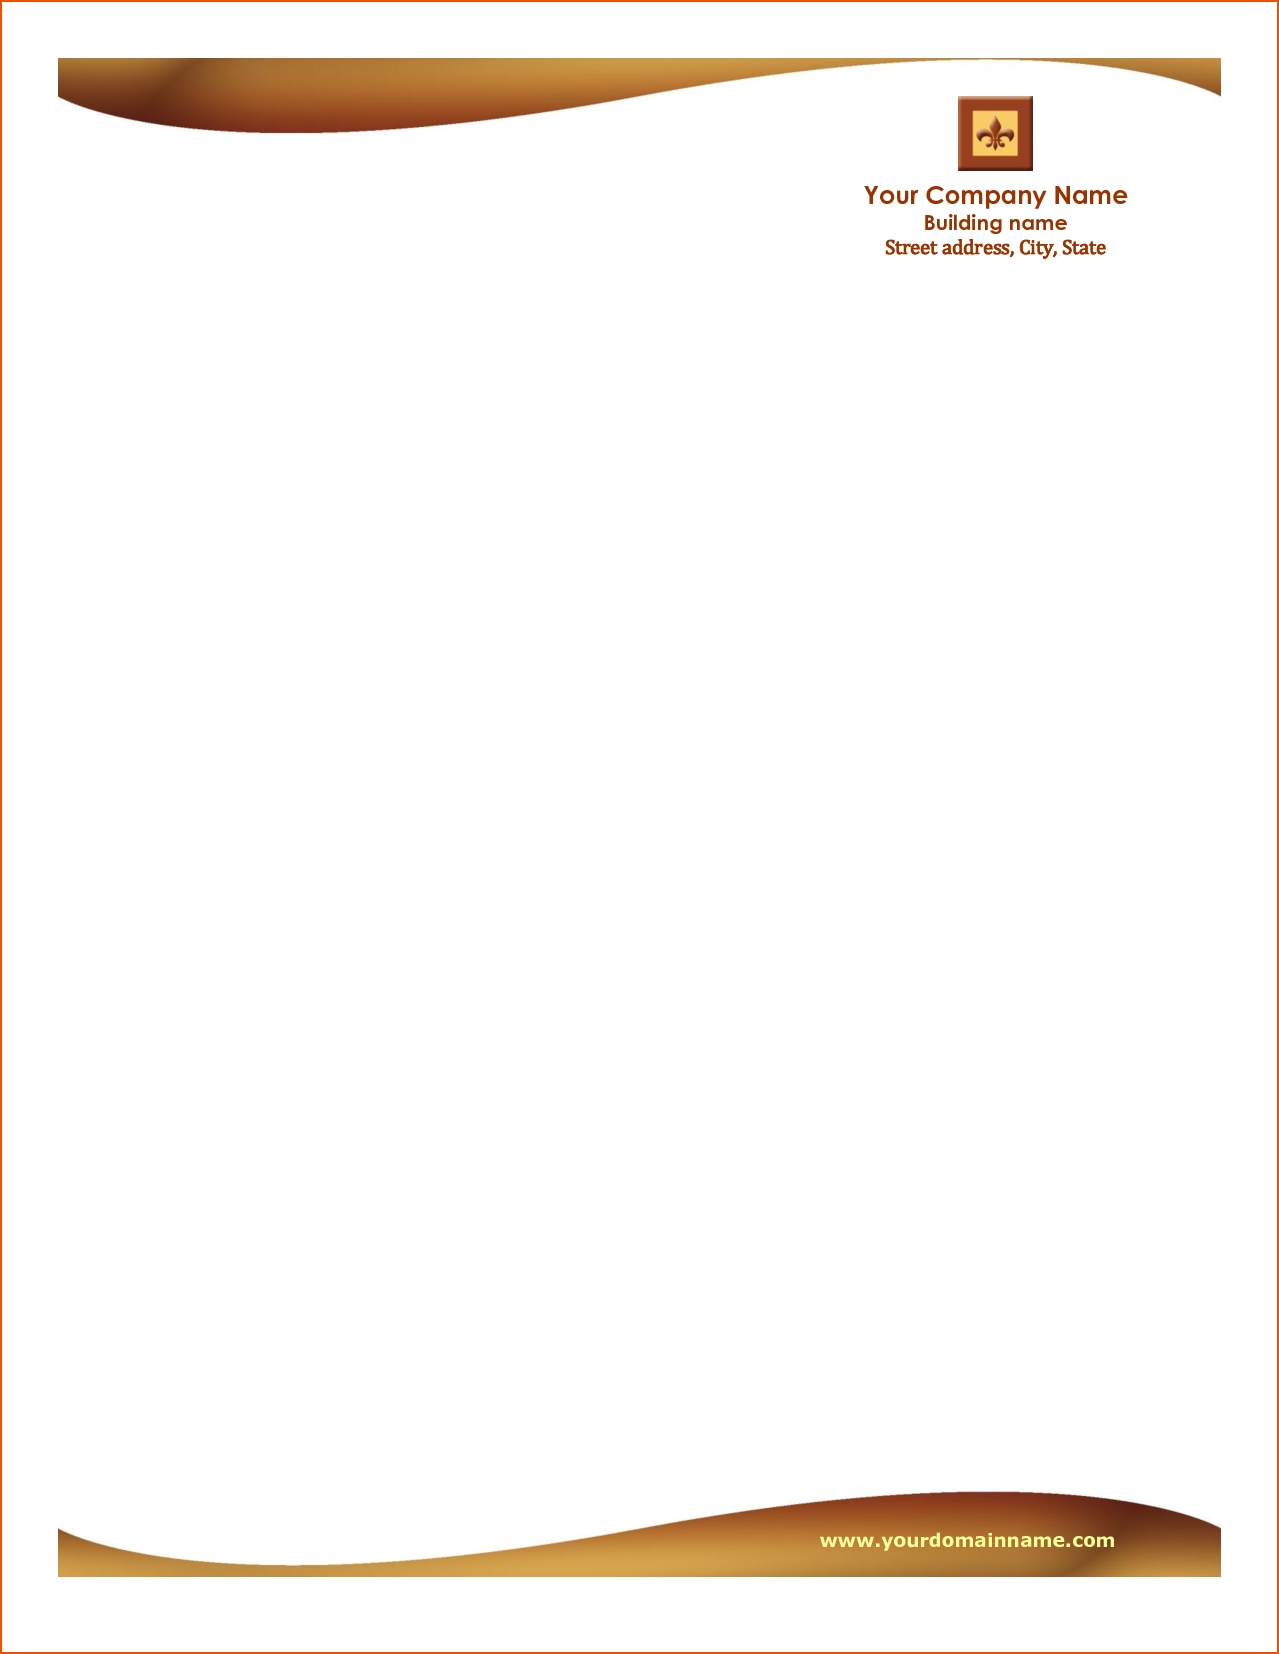 word business letterhead temp